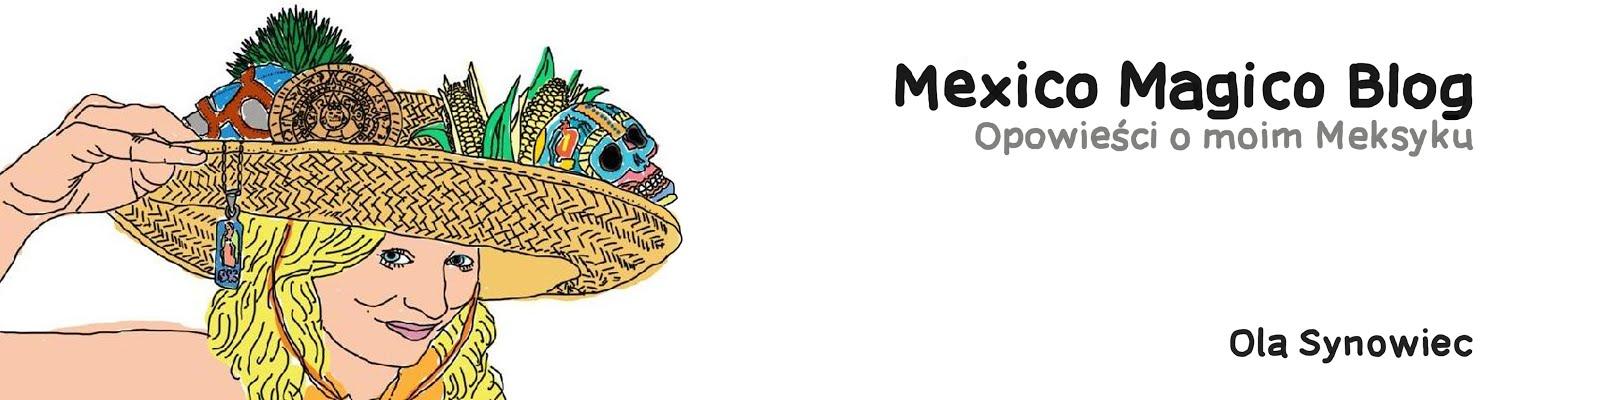 Mexico Magico Blog - Blog o Meksyku